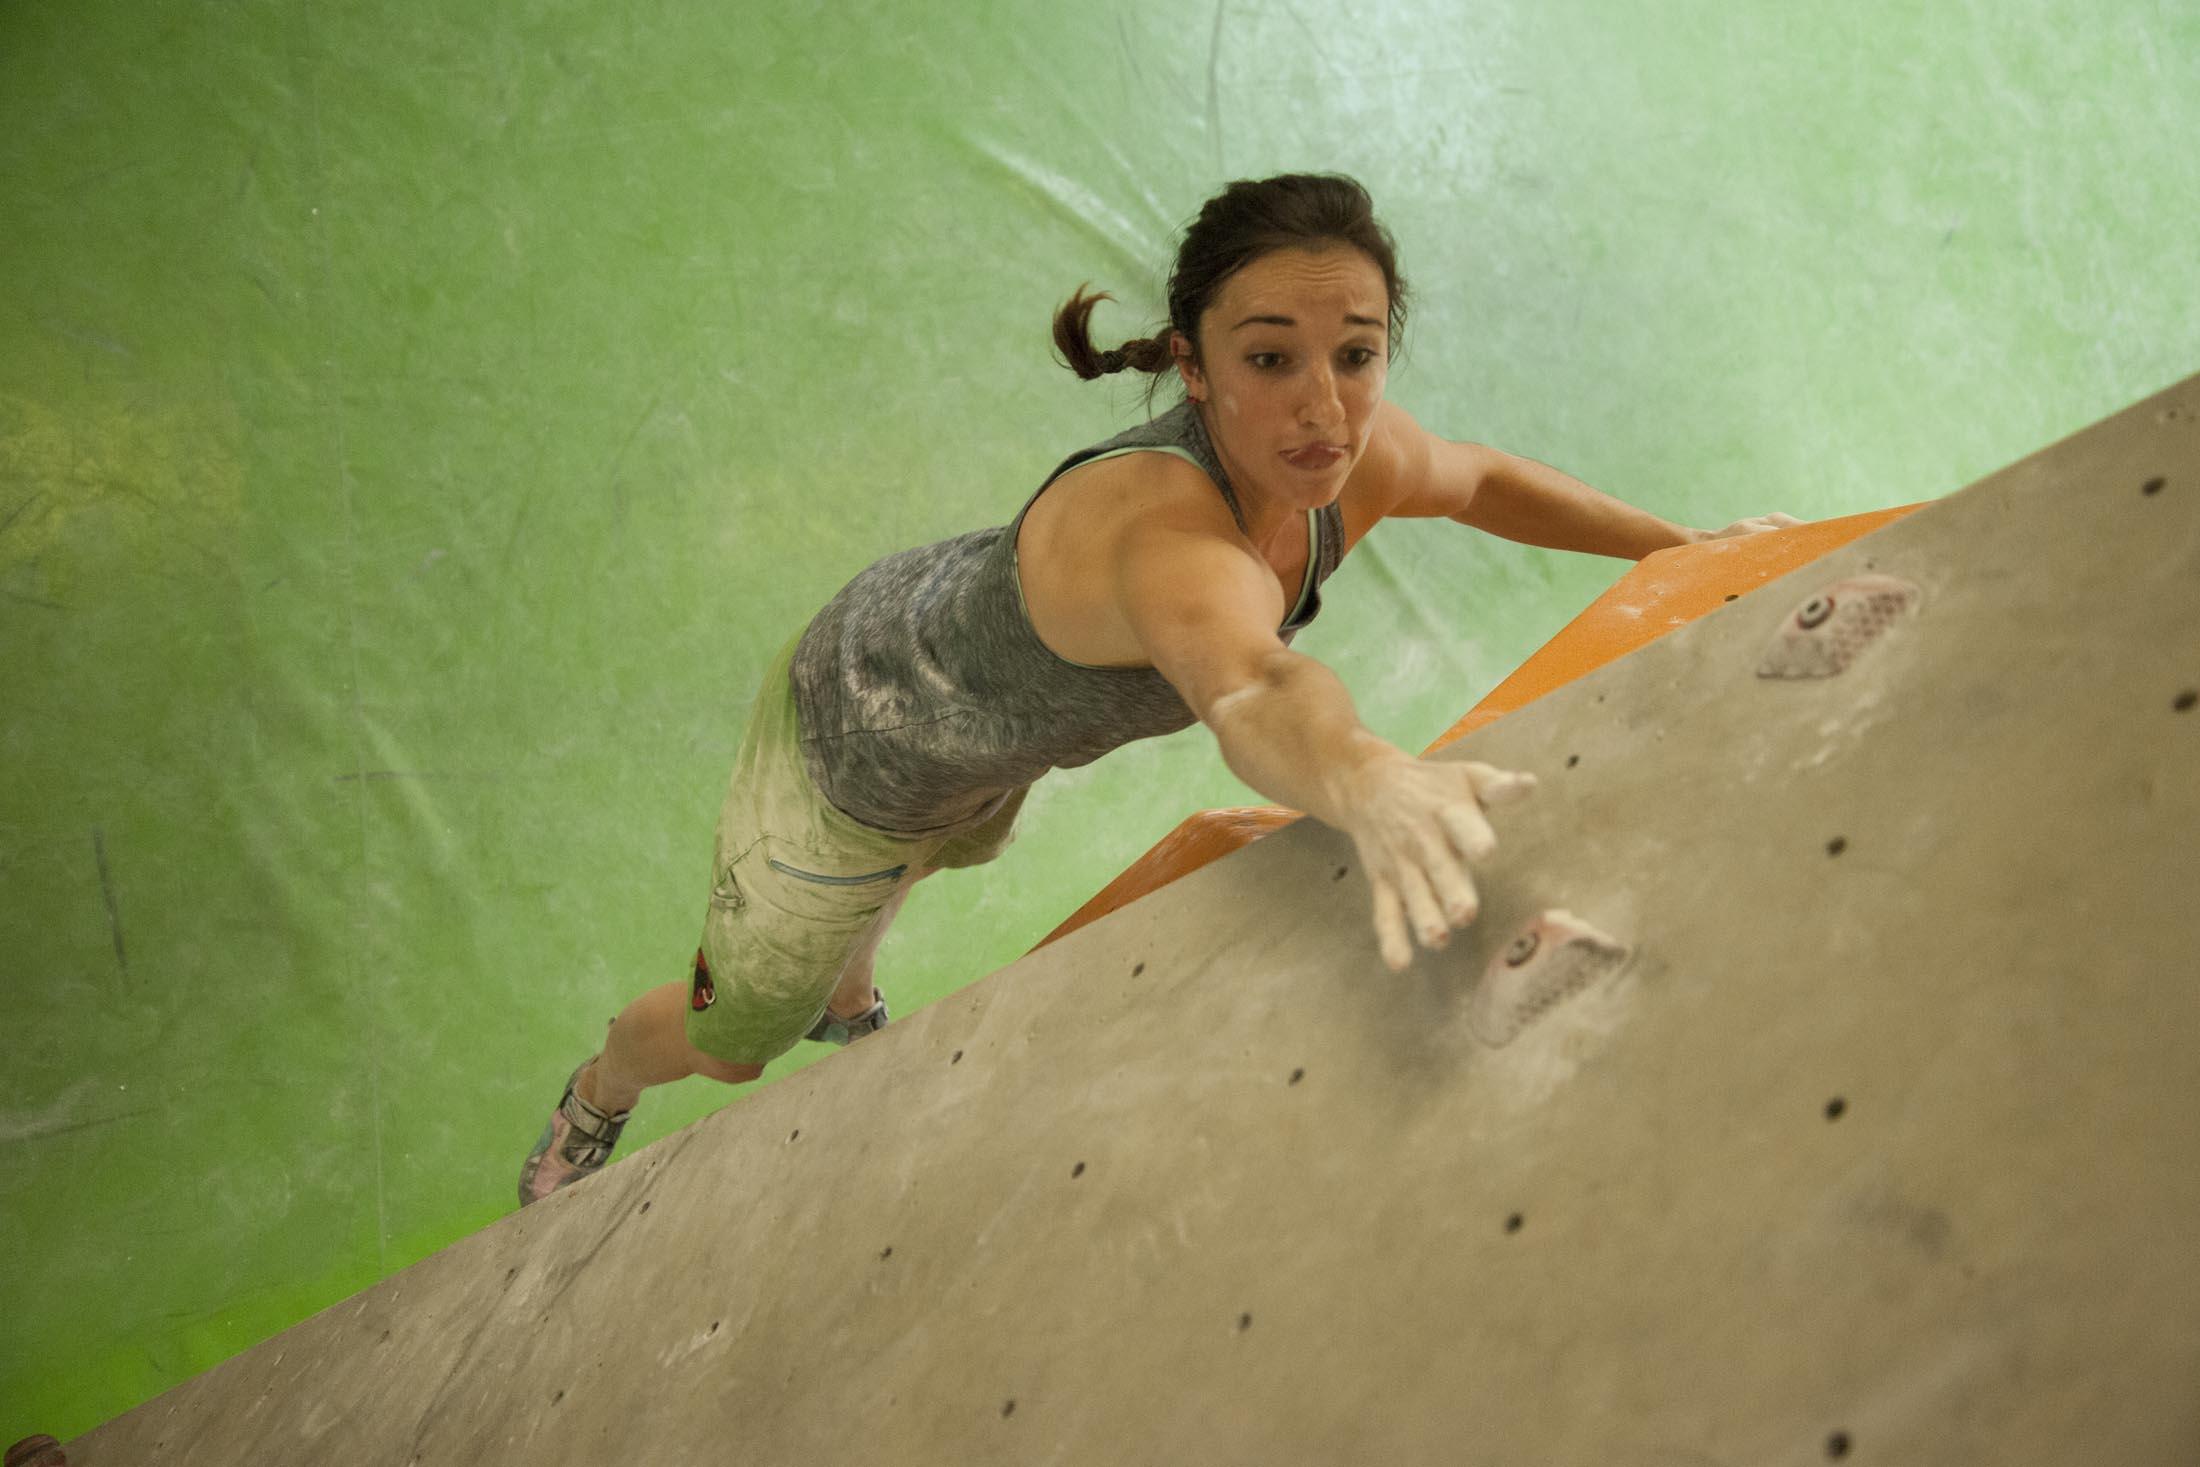 Juliane Wurm, internationaler bouldercup Frankenjura, BLOCKHELDEN Erlangen, Bergfreunde.de, Mammut07092016008